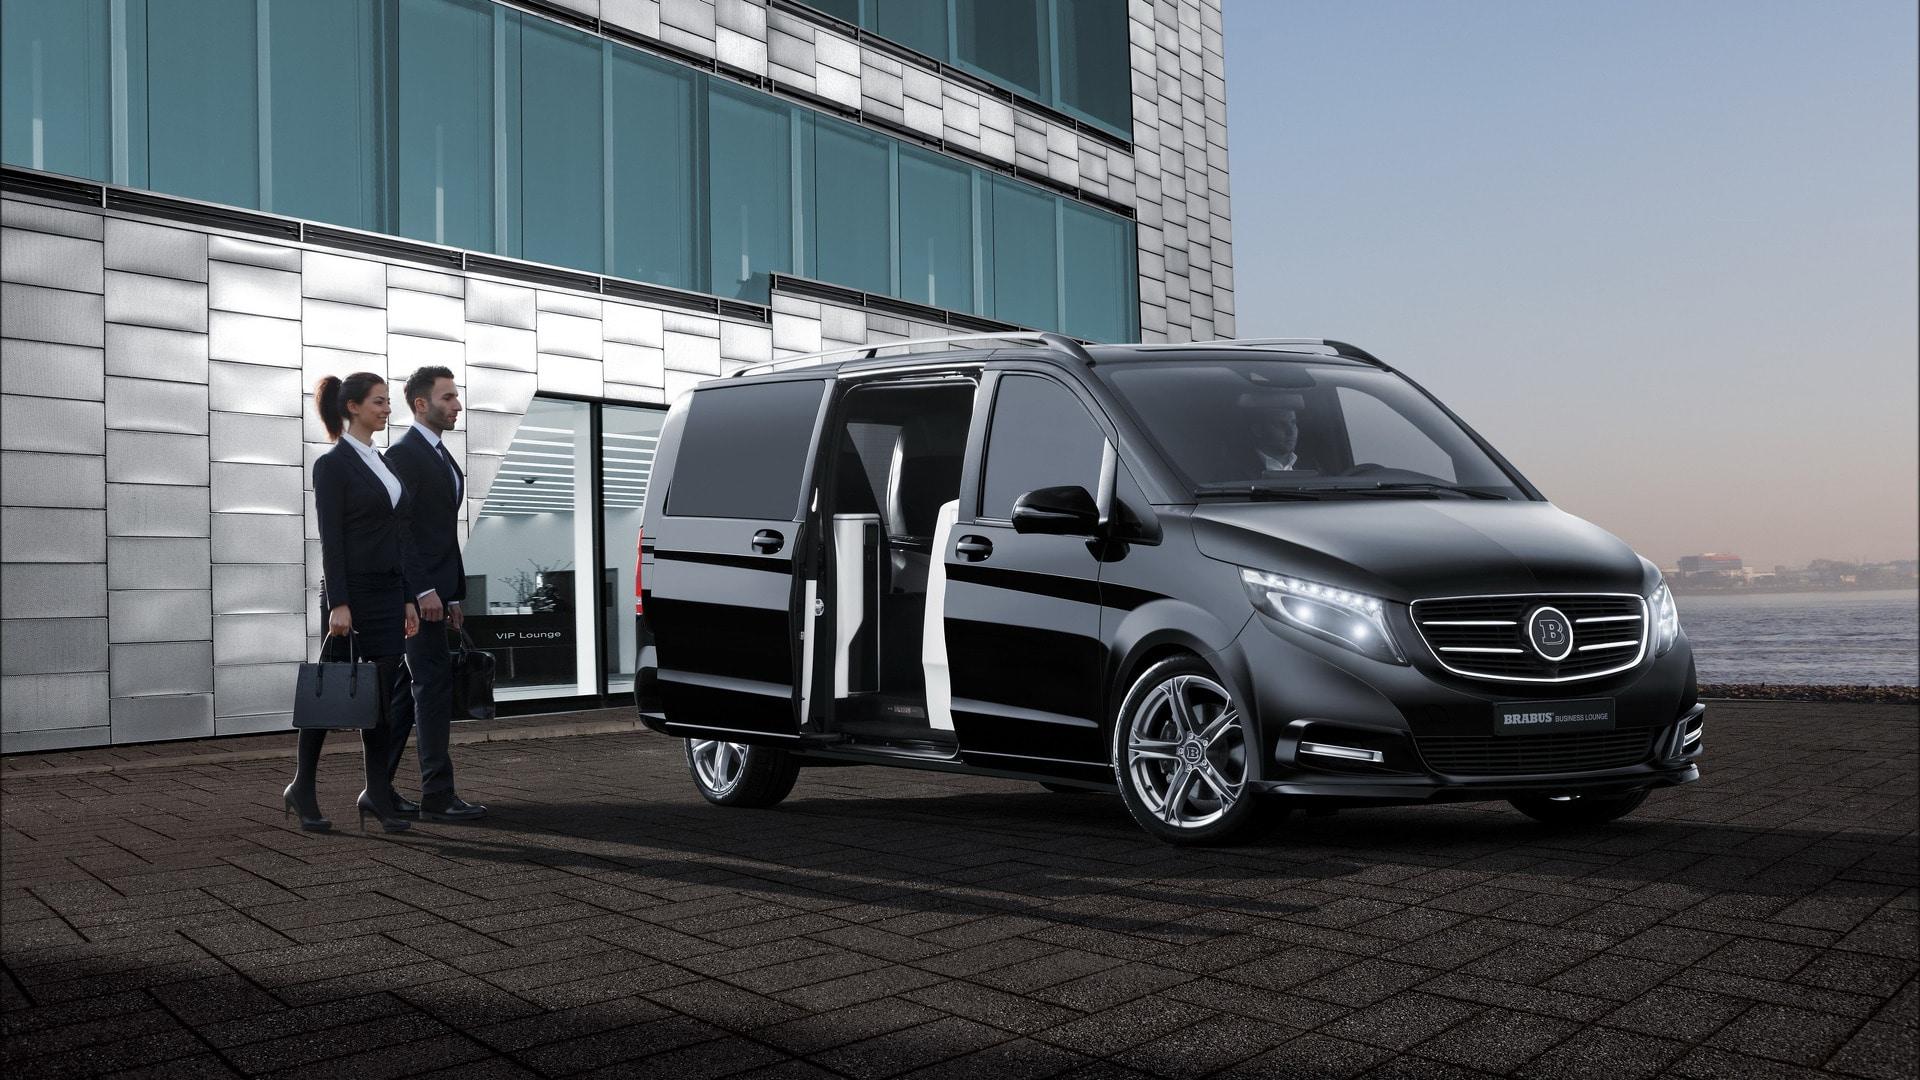 Mercedes V Class Chauffeur Hire UK